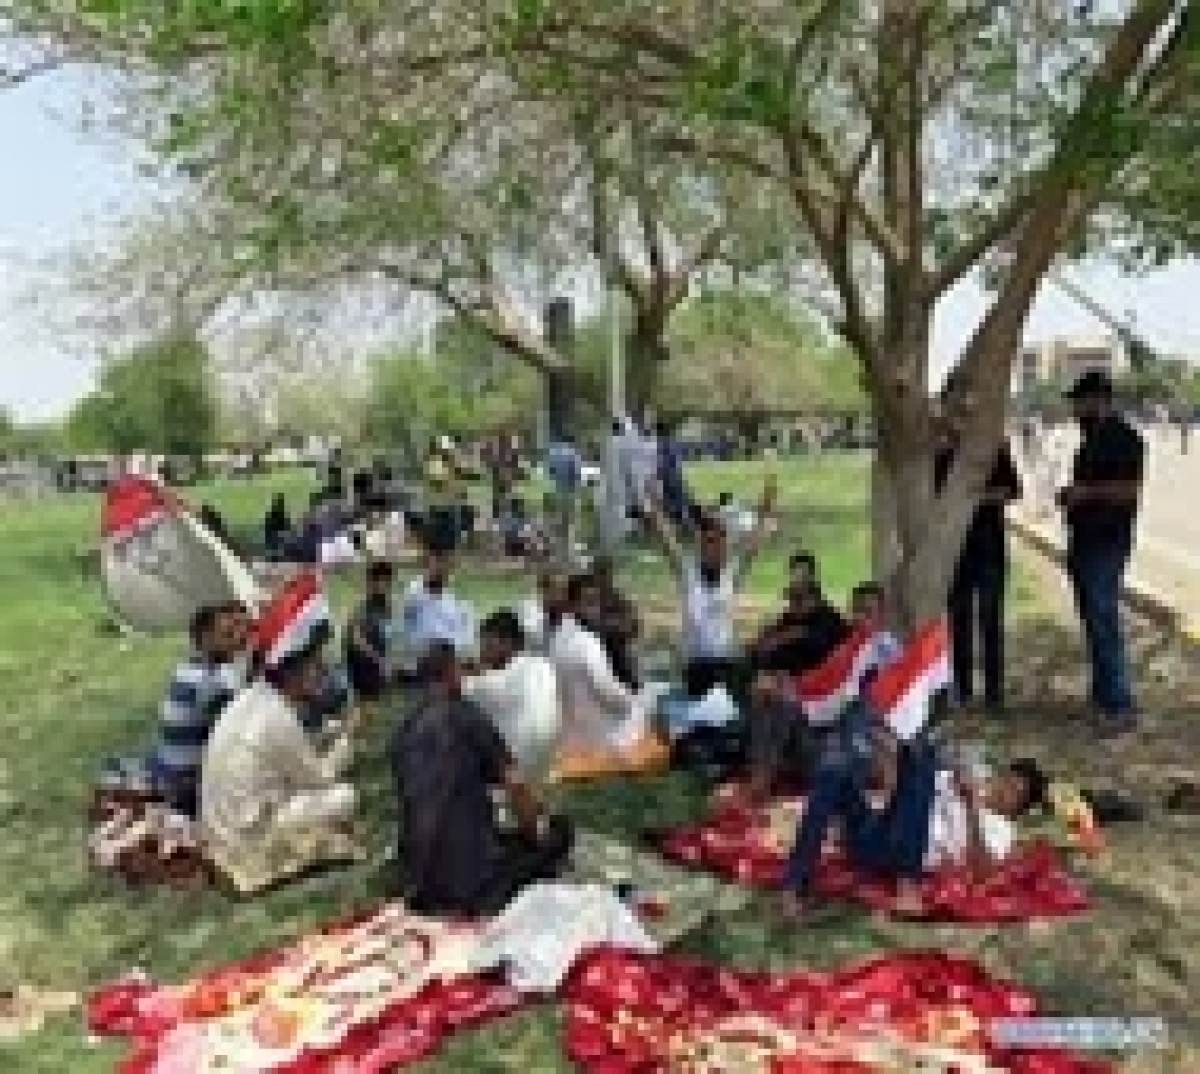 Iraqi forces shut down Baghdad amid political crisis